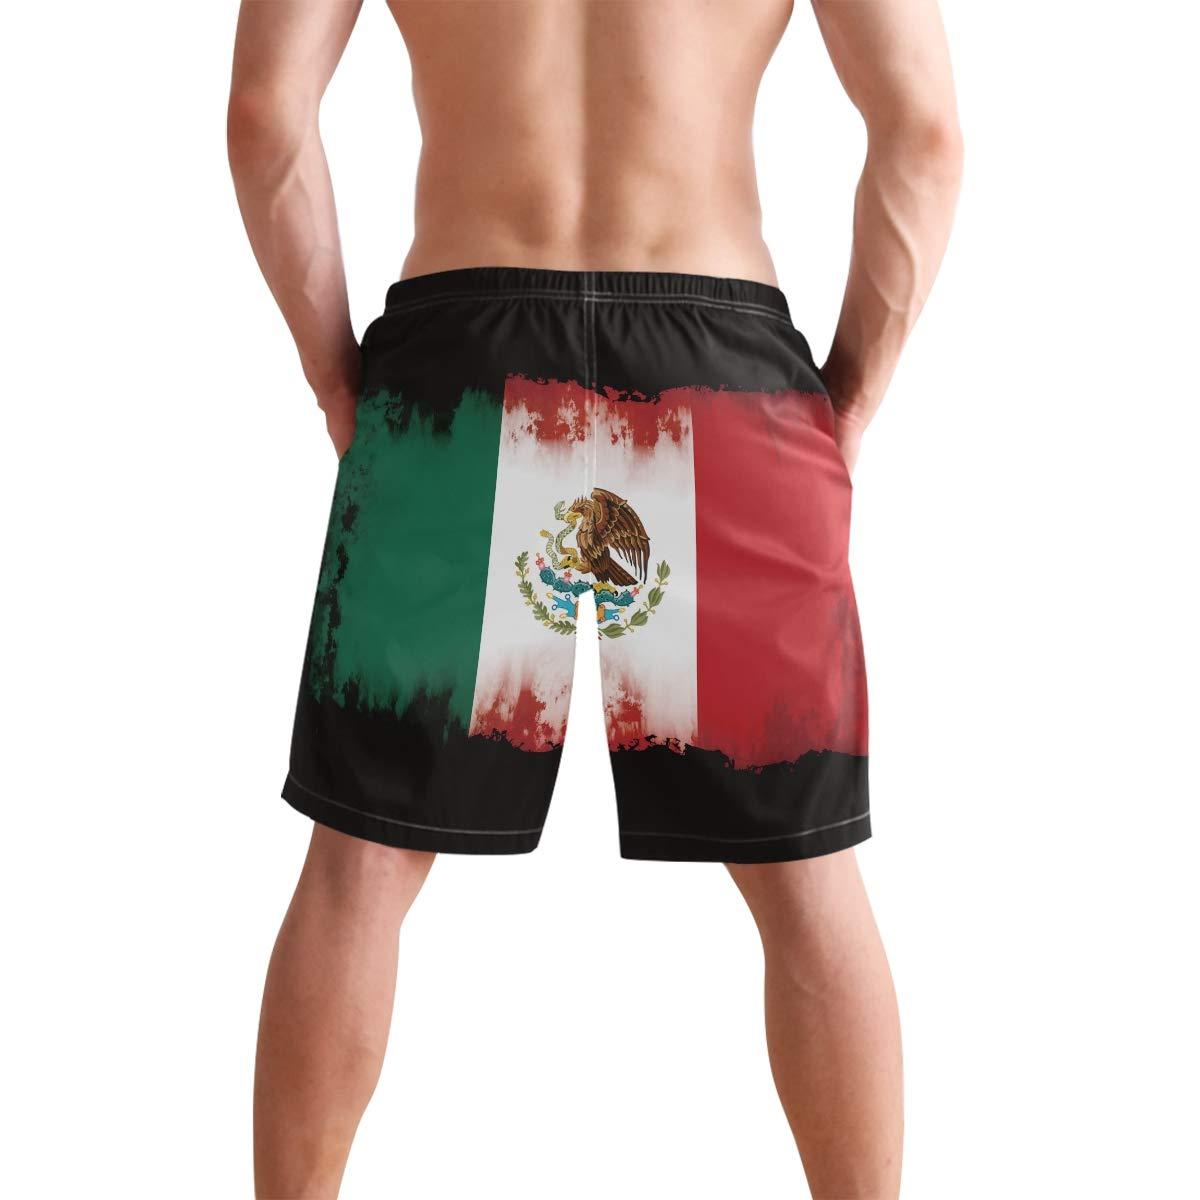 DongDongQiang Men Summer Mexician Flag Grunge Quick Dry Volleyball Beach Shorts Board Shorts